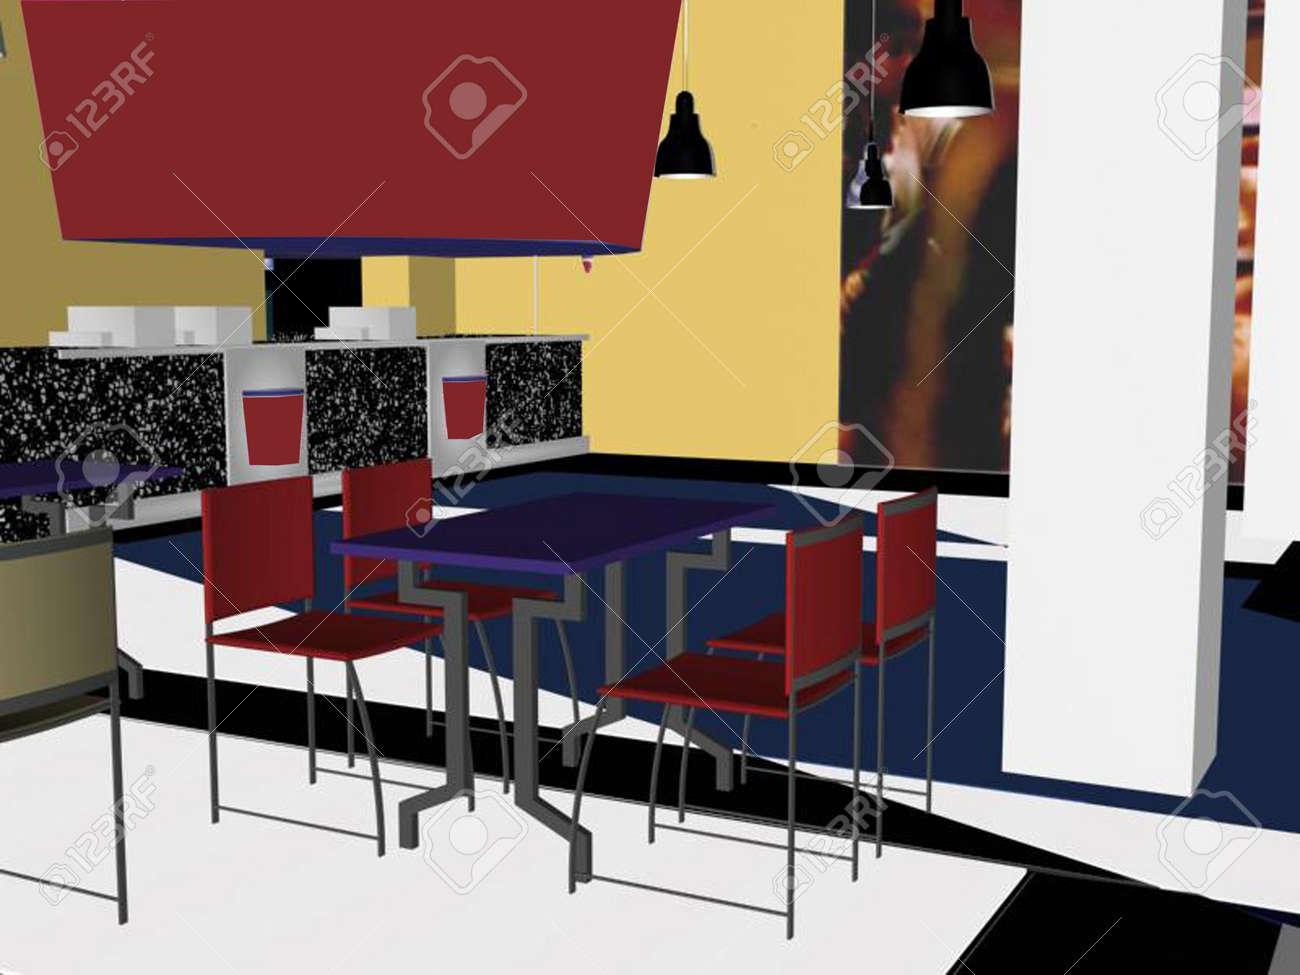 Interiors - (for similar images see my portfolio) Stock Photo - 526188